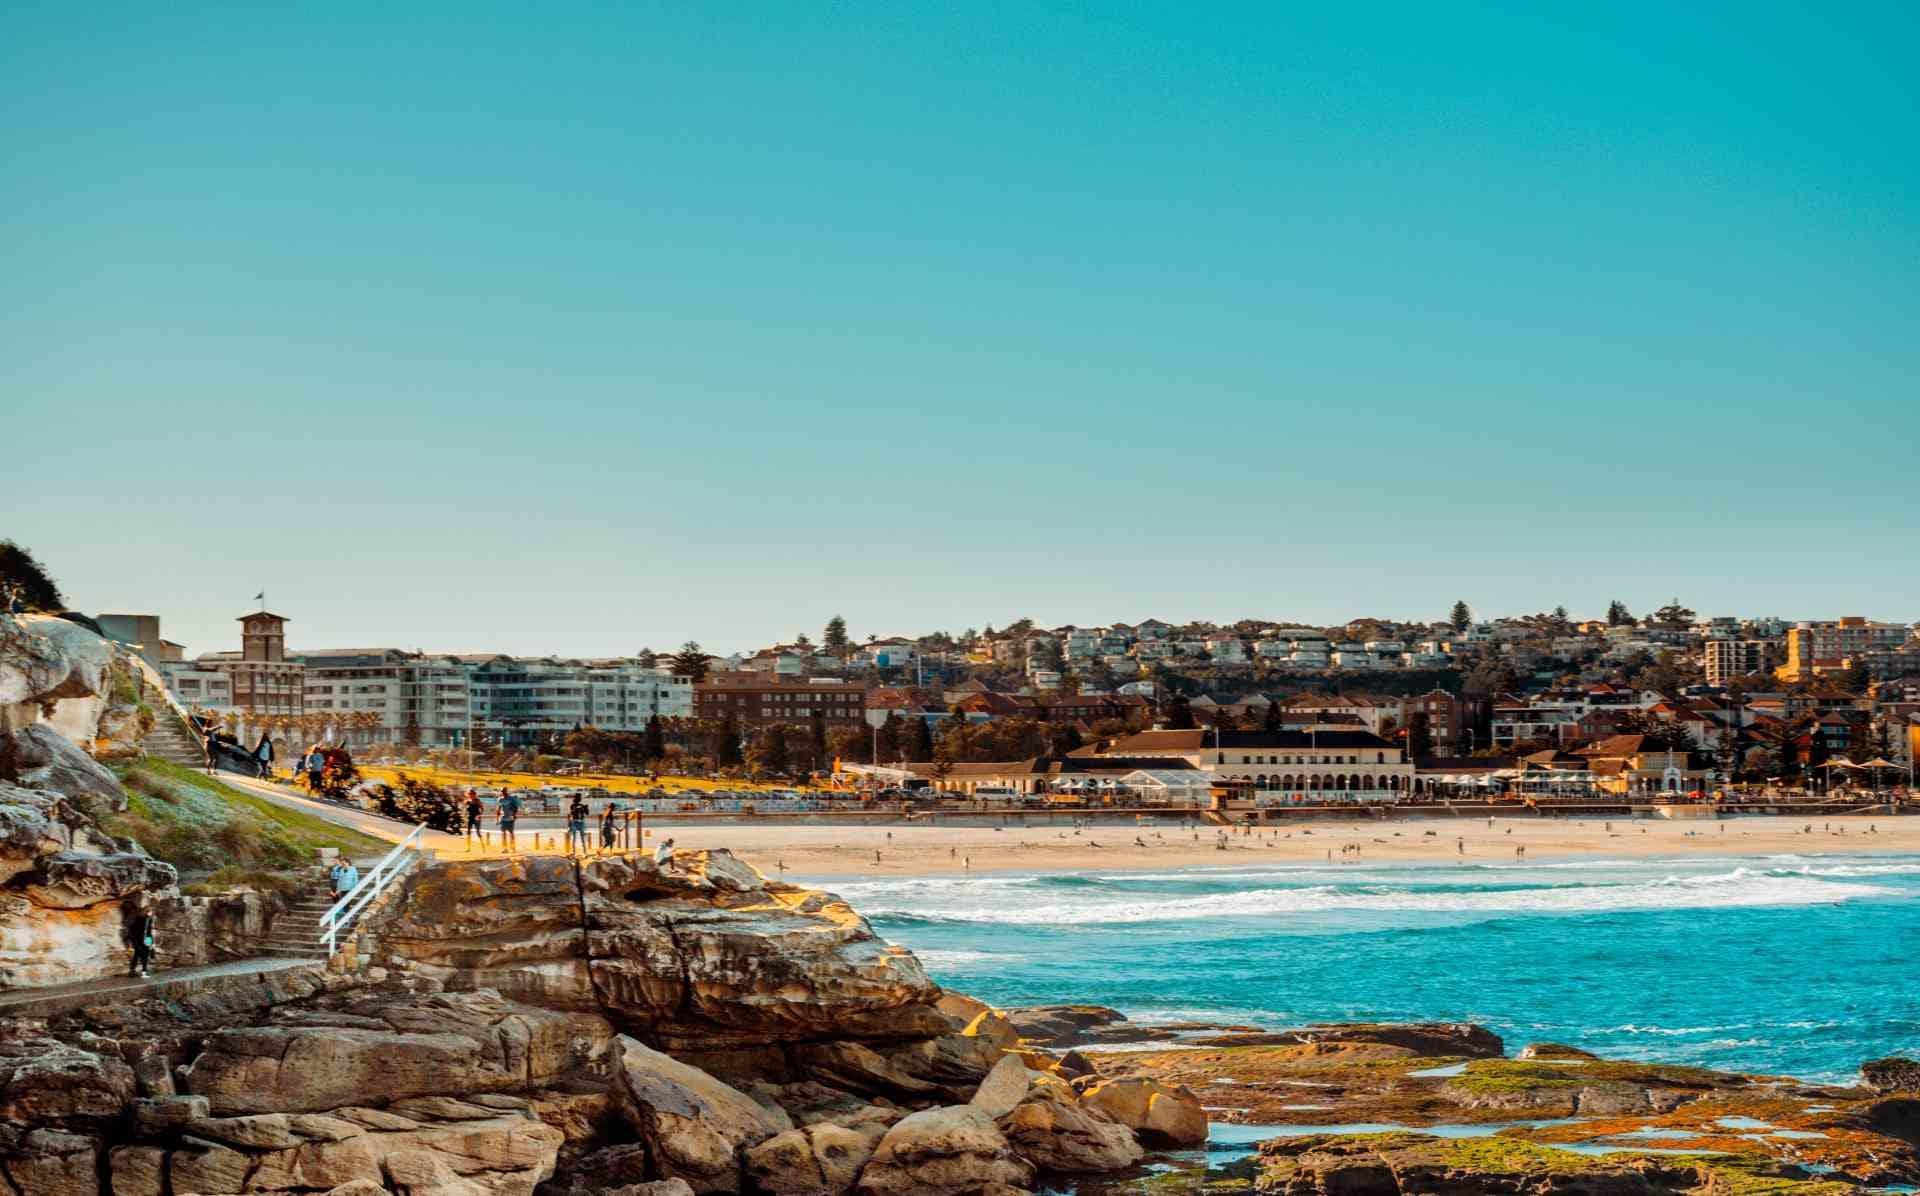 Bondi Beach Sydney: Party of a Lifetime [QUEST IN TEST MODE] image